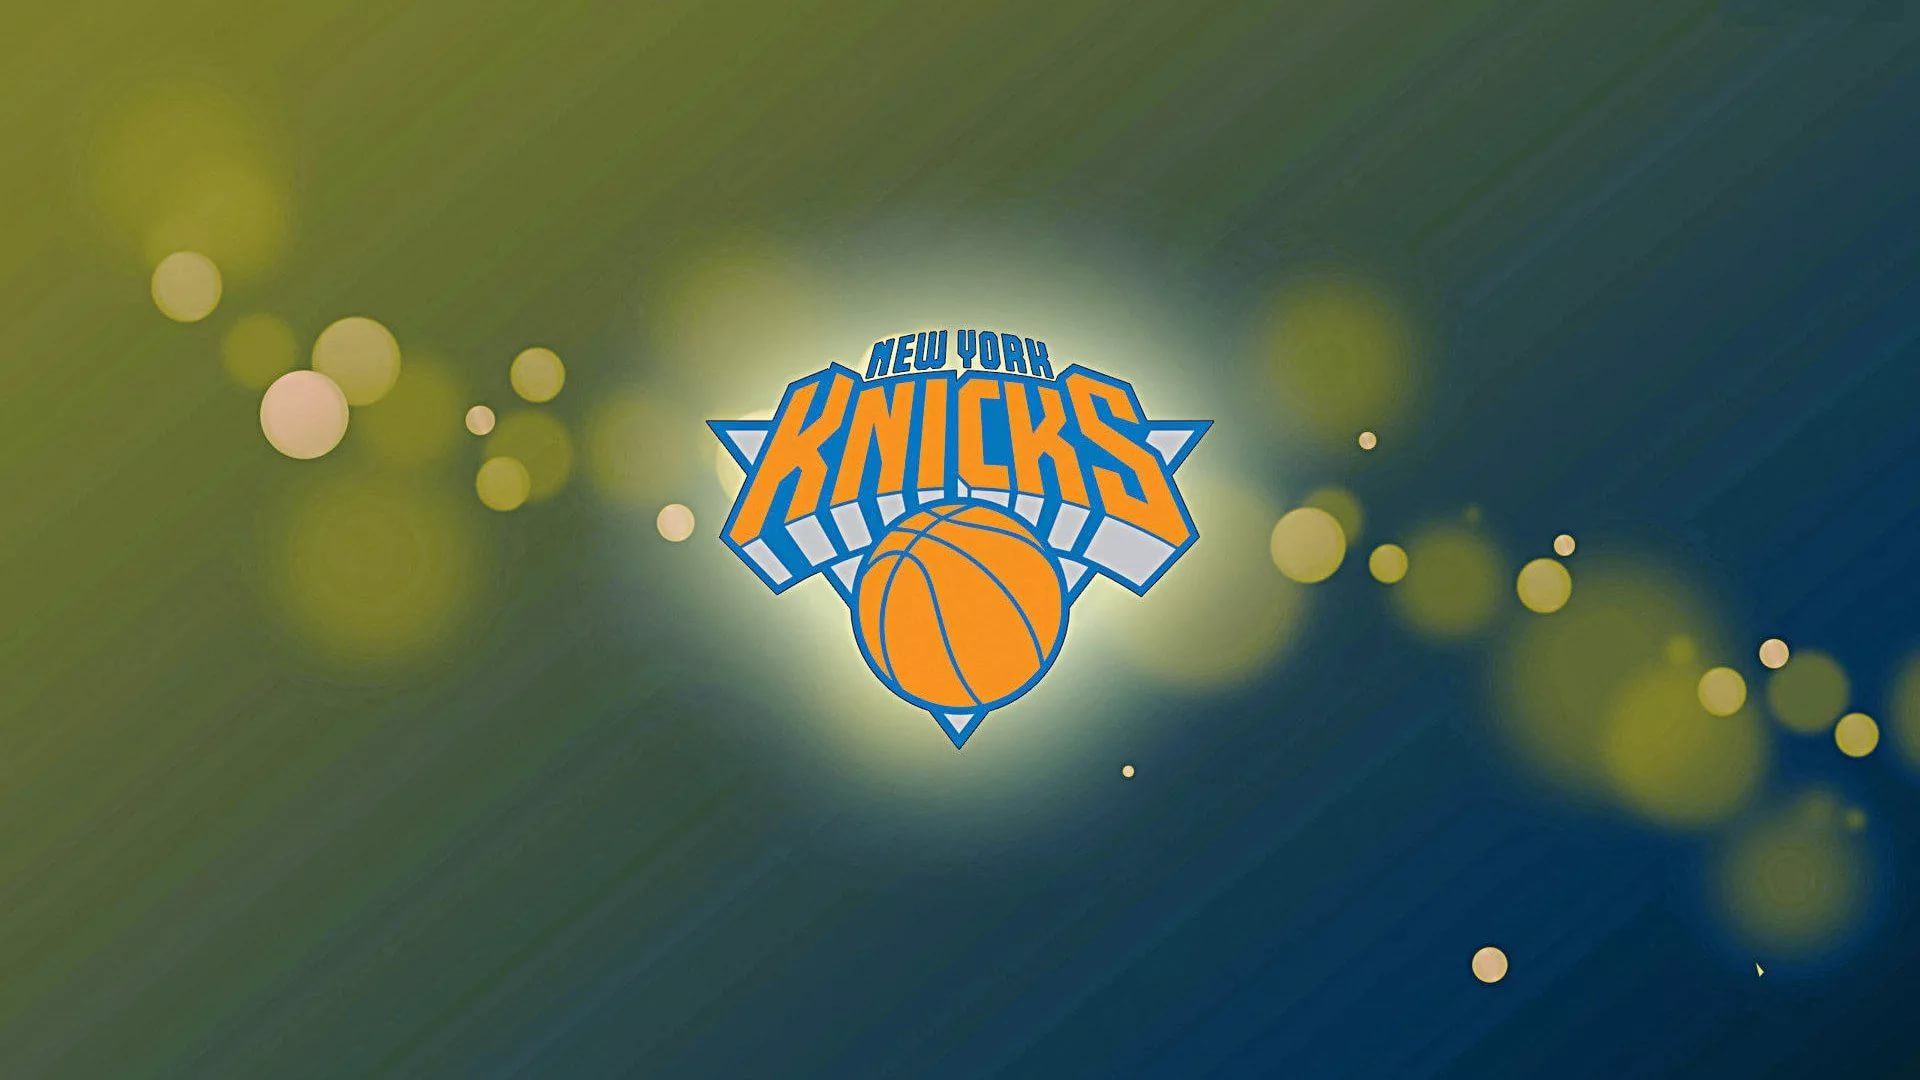 New York Knicks Background